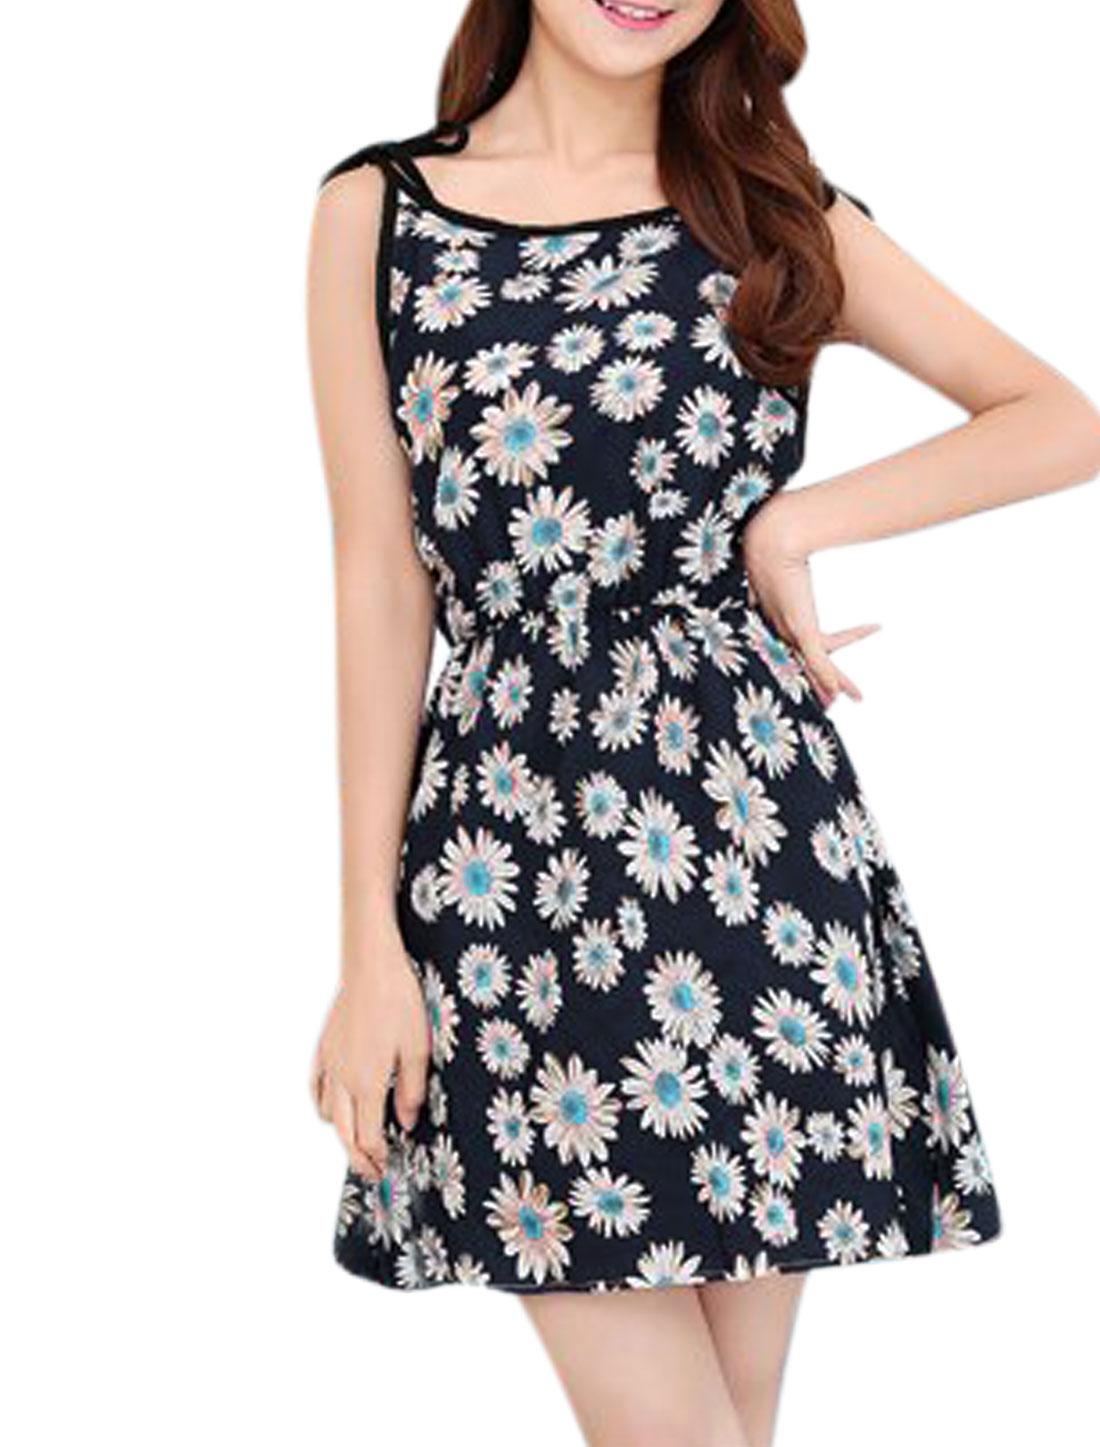 Ladies Elastic Waist Sleeveless Flower Prints Sun Dress Navy Blue XS